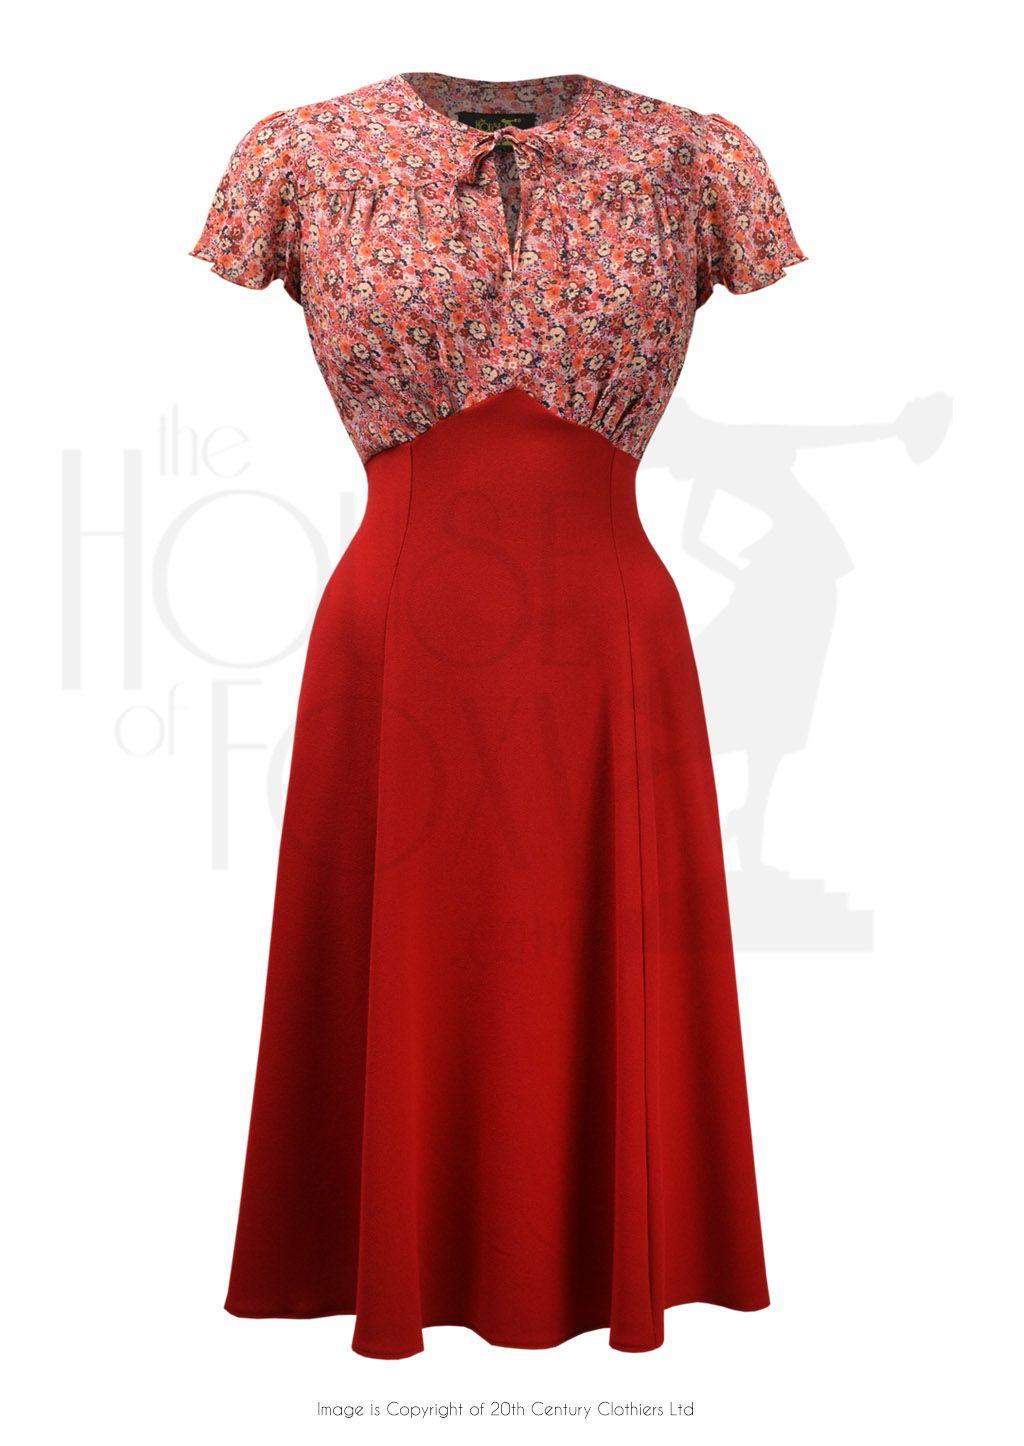 05137d89bcb 40s Grable Tea Dress - Red Ditsy. 1940s Style Grable Tea Swing Dance ...